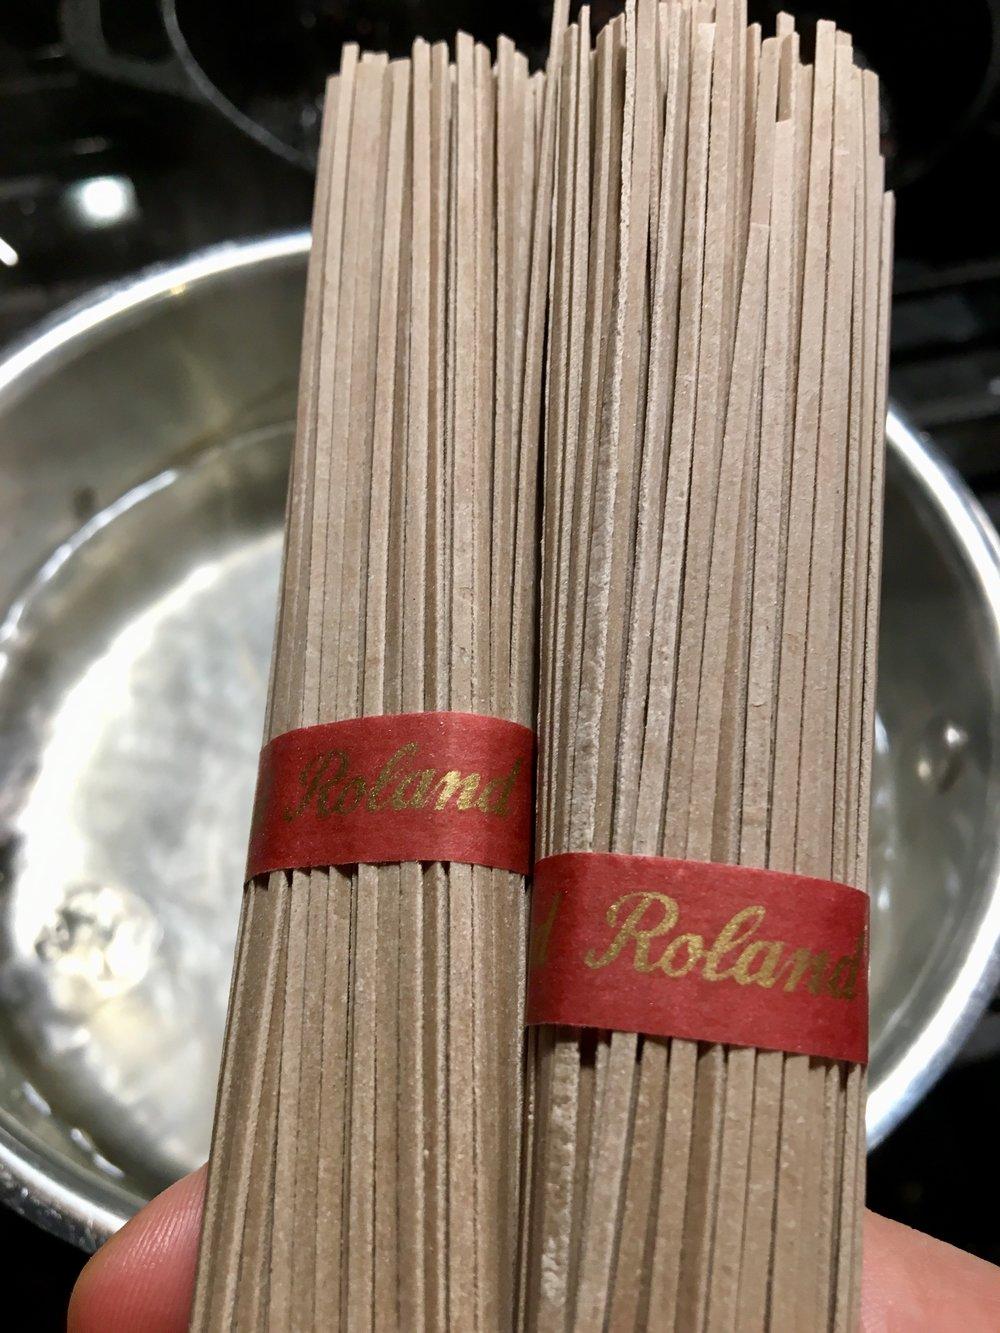 Soba Noodles (Buckwheat Noodles)